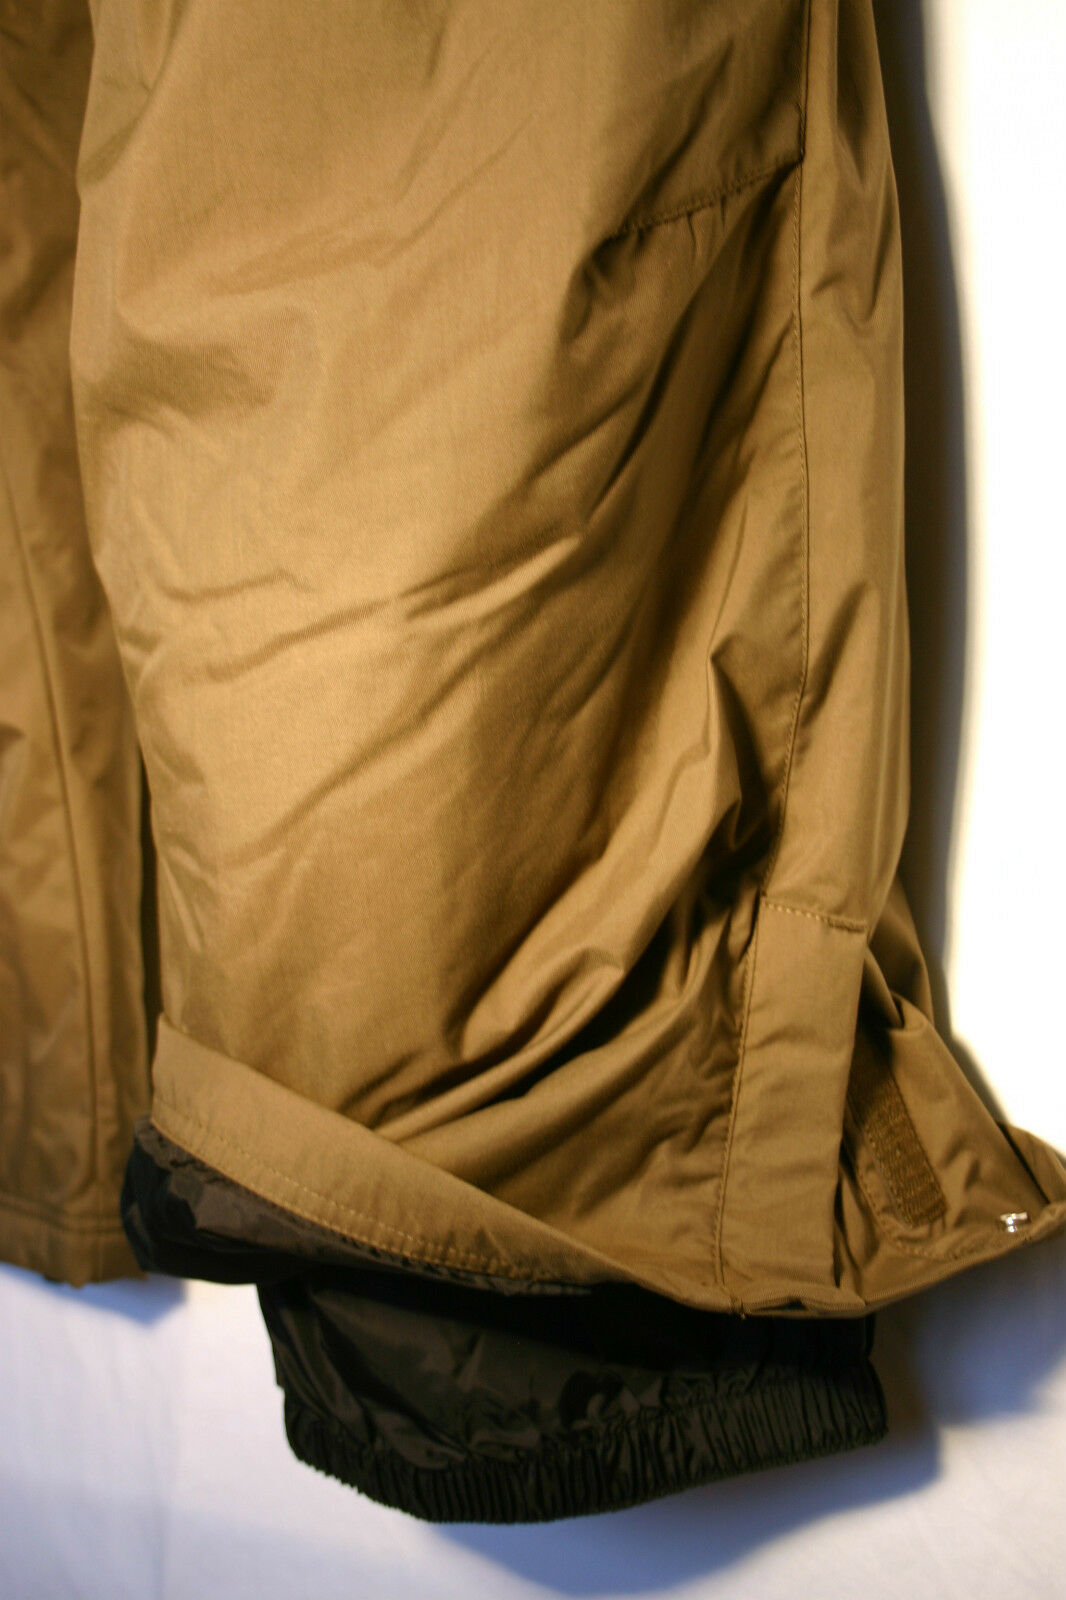 Billabong Billabong Billabong CAT Boardhose Snowboardhose Skihose Boardpant Herren NEU XL Oliv 1948ac